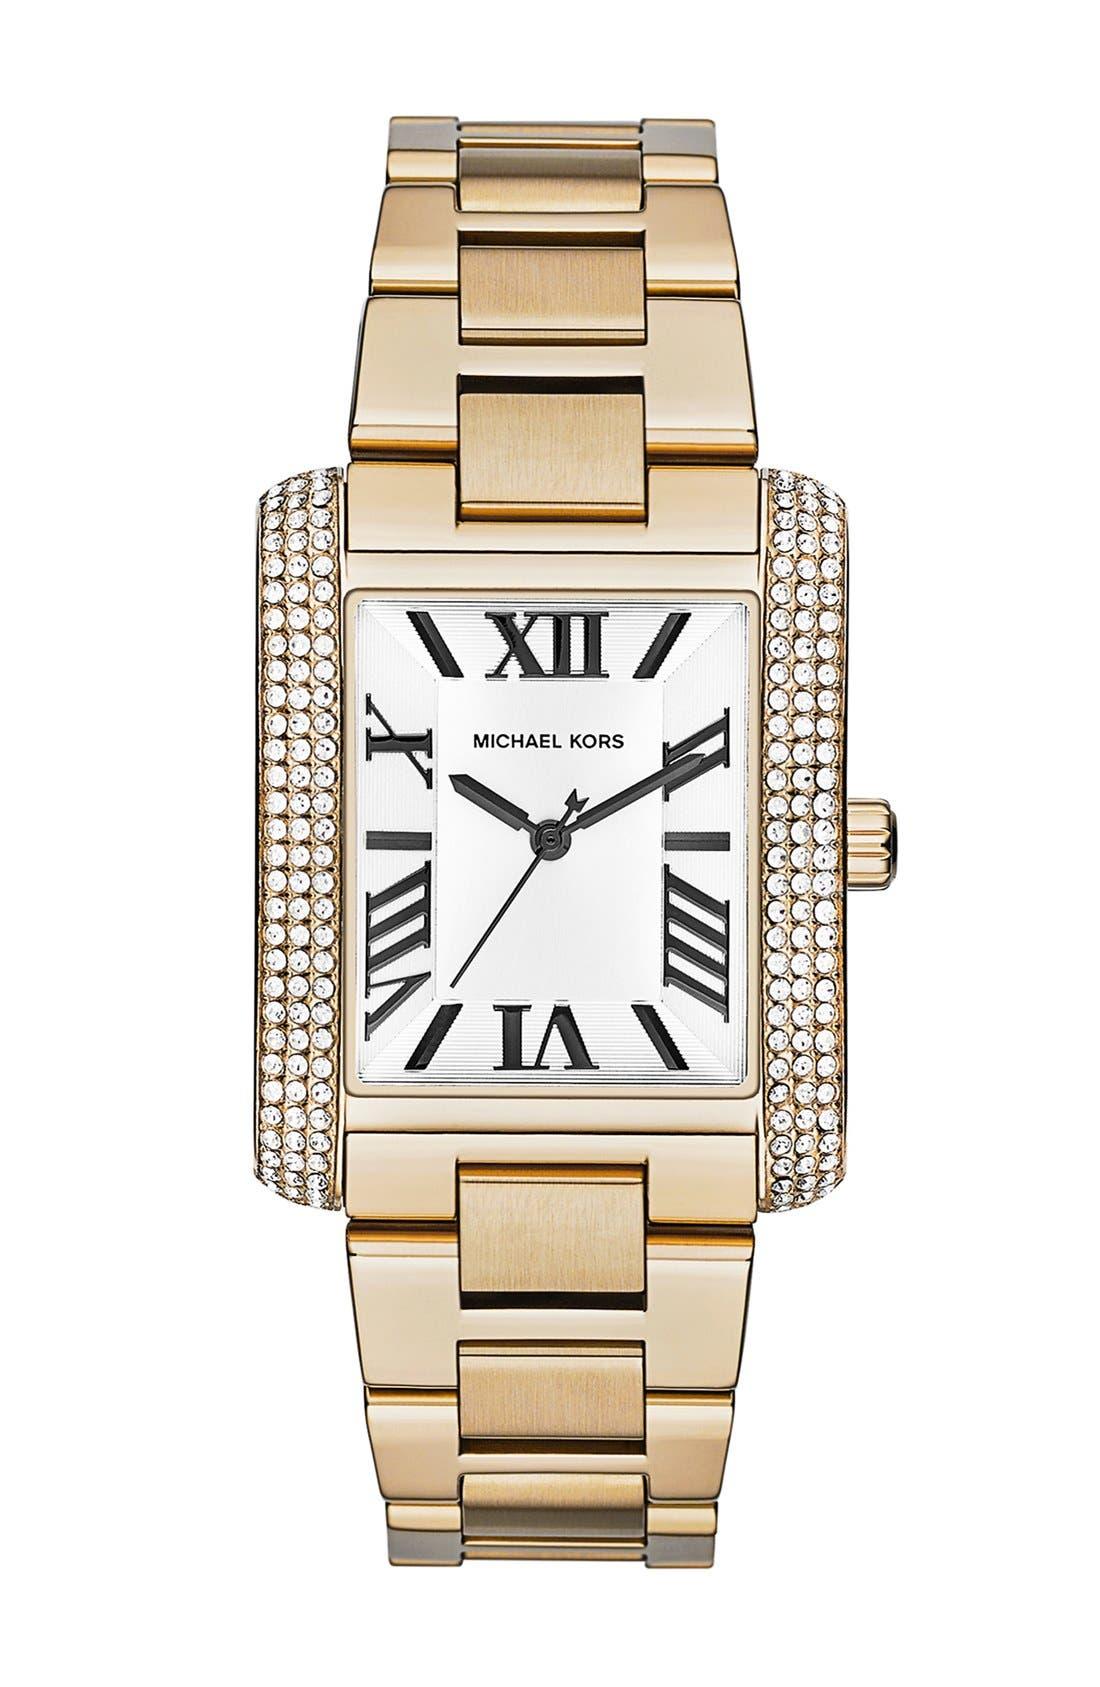 Main Image - Michael Kors 'Emery' Crystal Accent Bracelet Watch, 31mm x 40mm